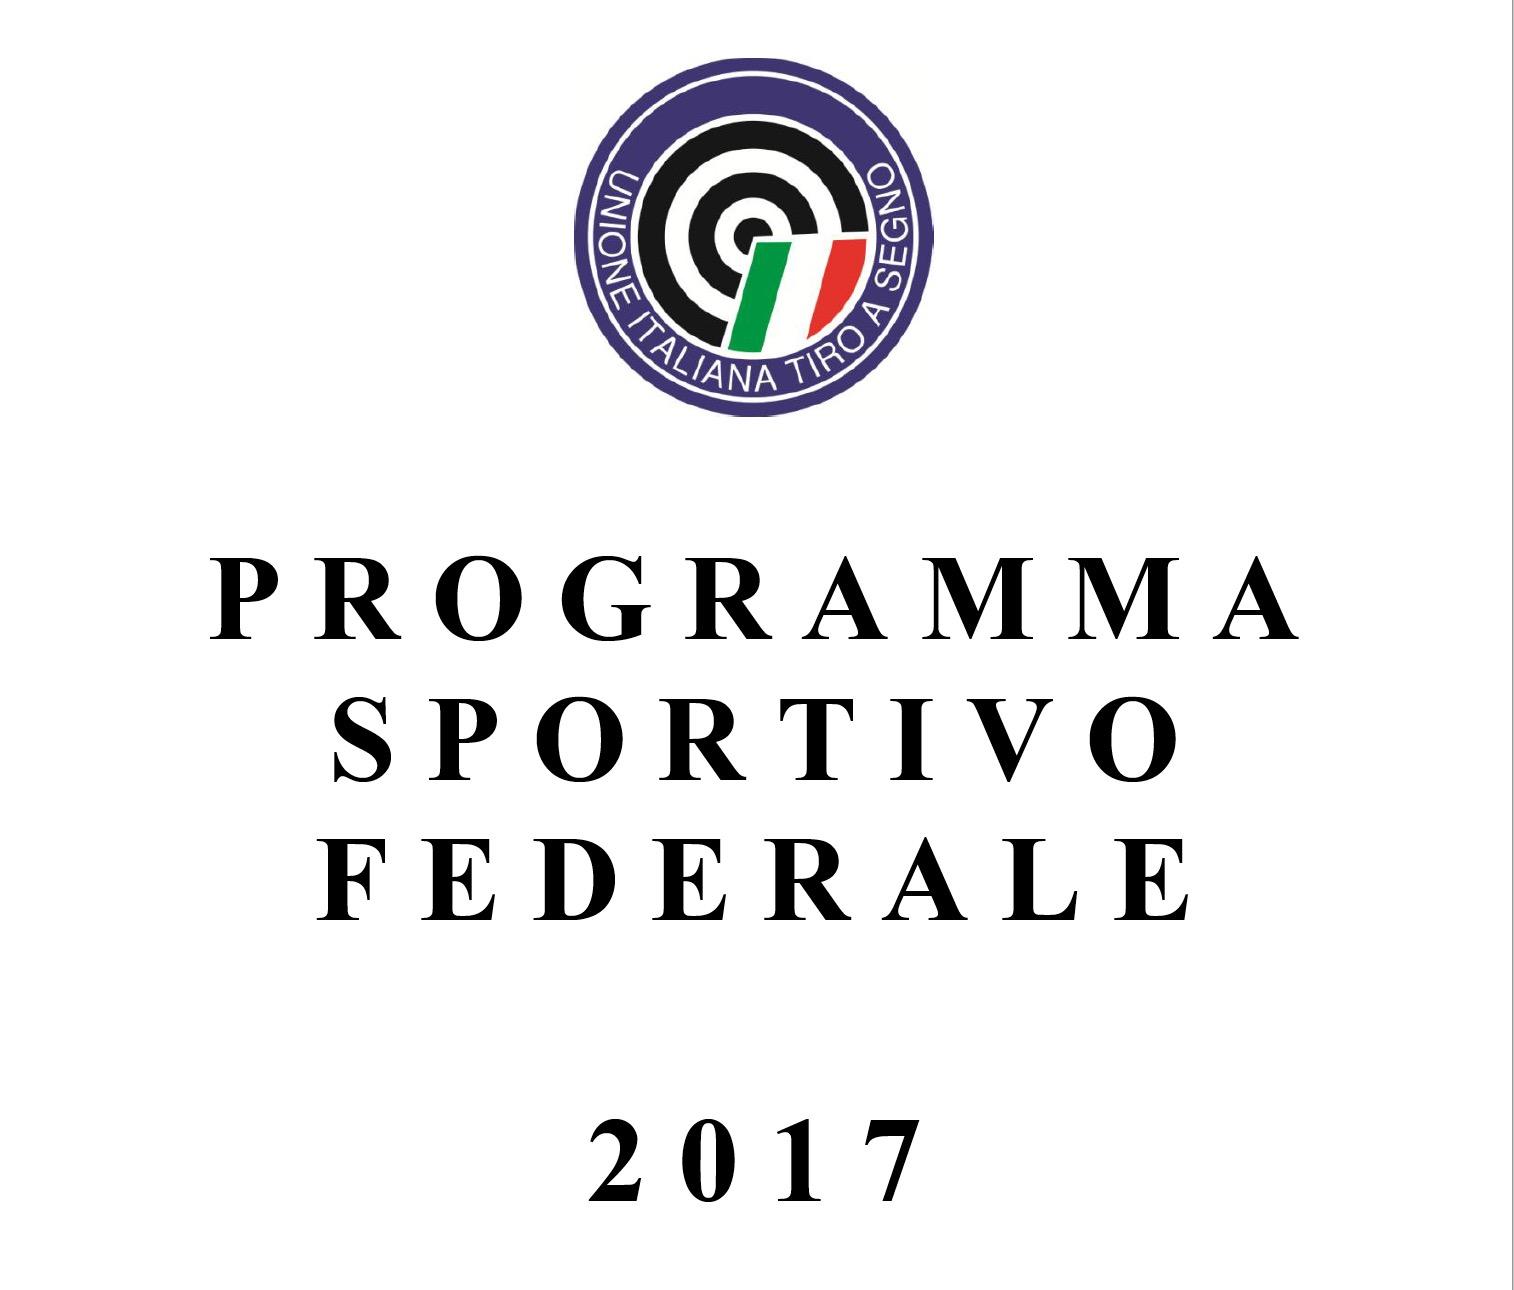 Programma sportivo federale 2017 tsn bagheria - Porta d armi uso sportivo ...